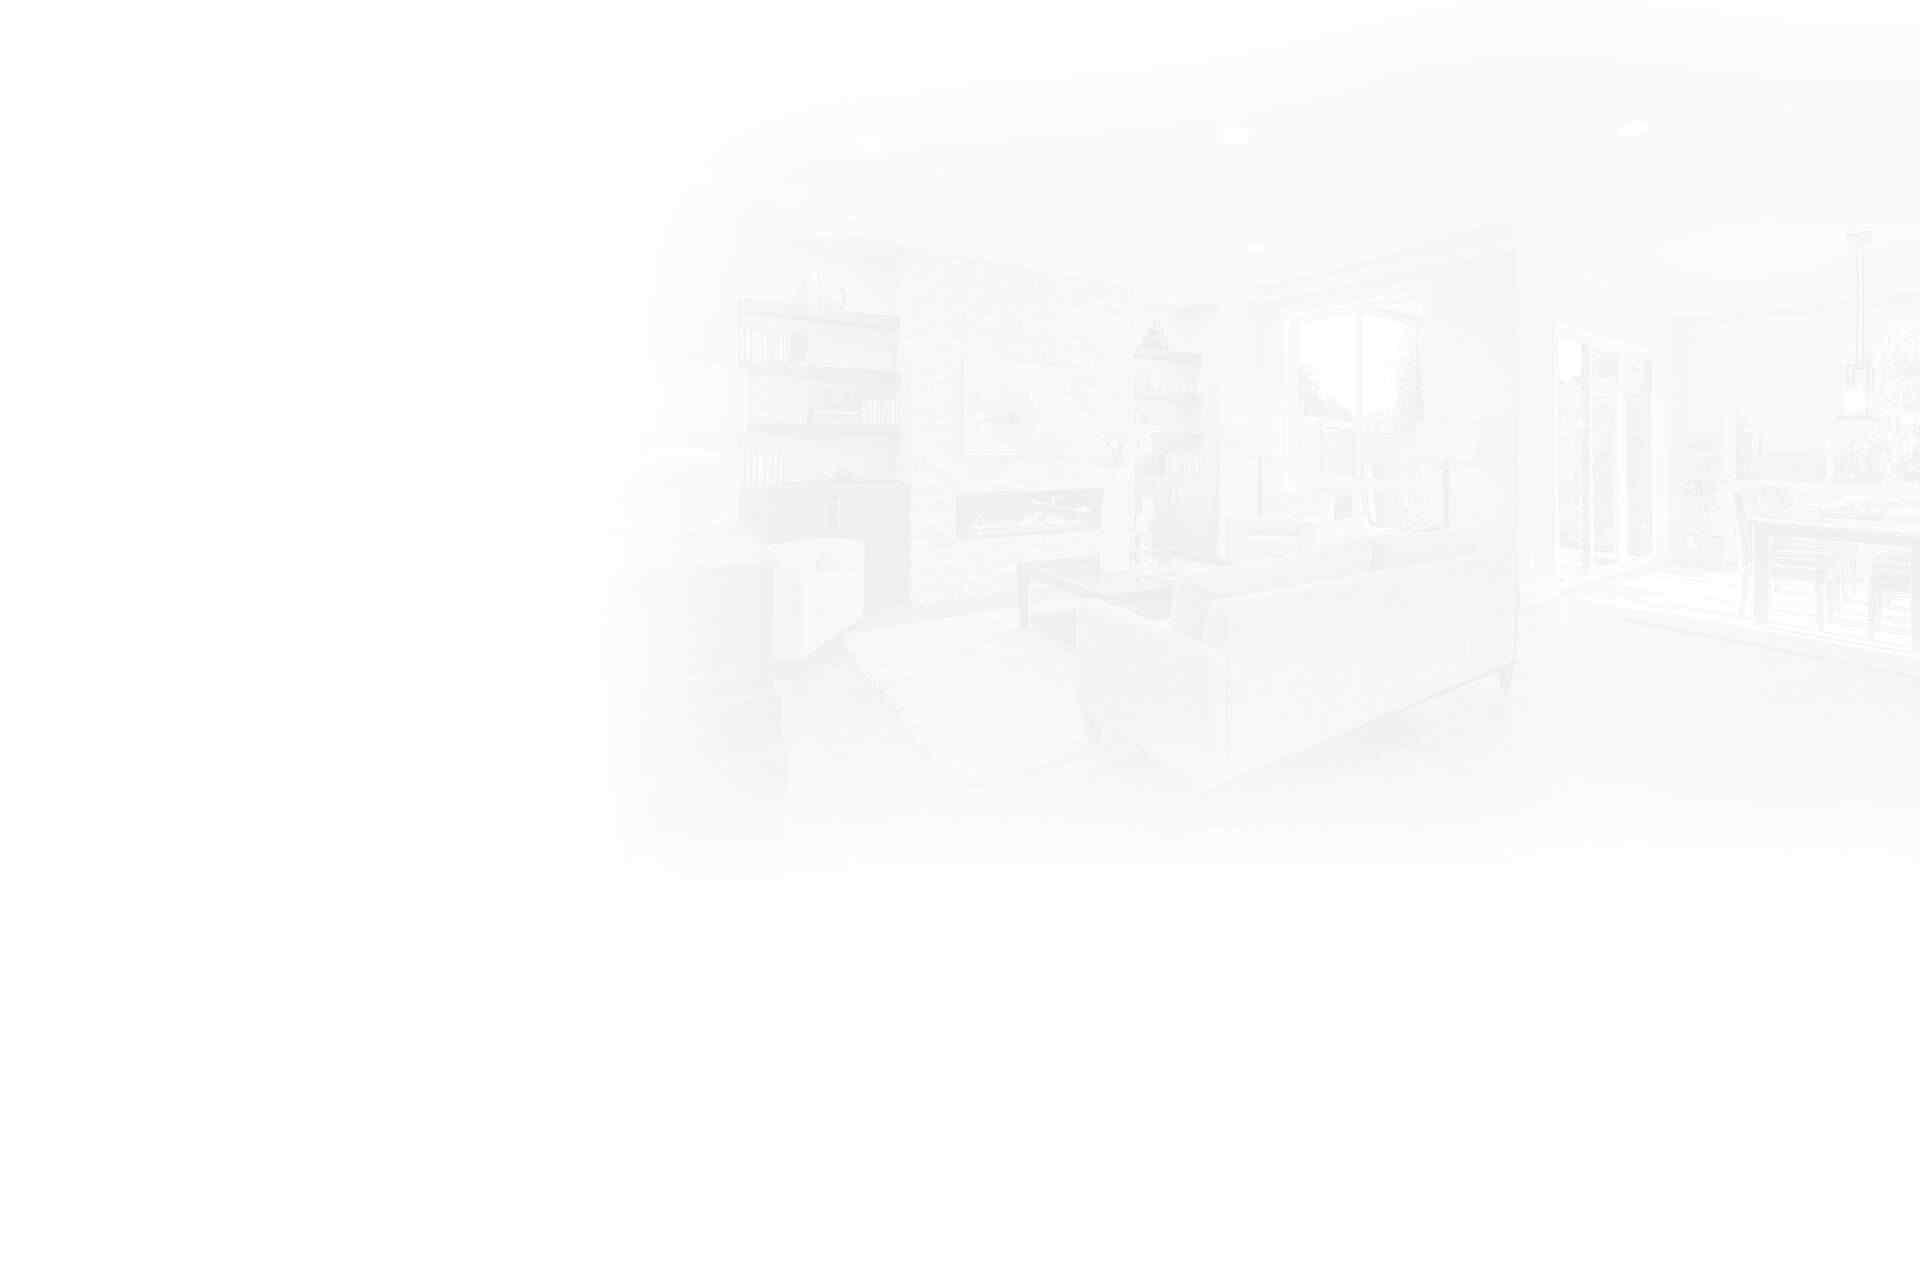 https://mvrcostruzioni.it/wp-content/uploads/2018/10/background_grayscale_03.jpg